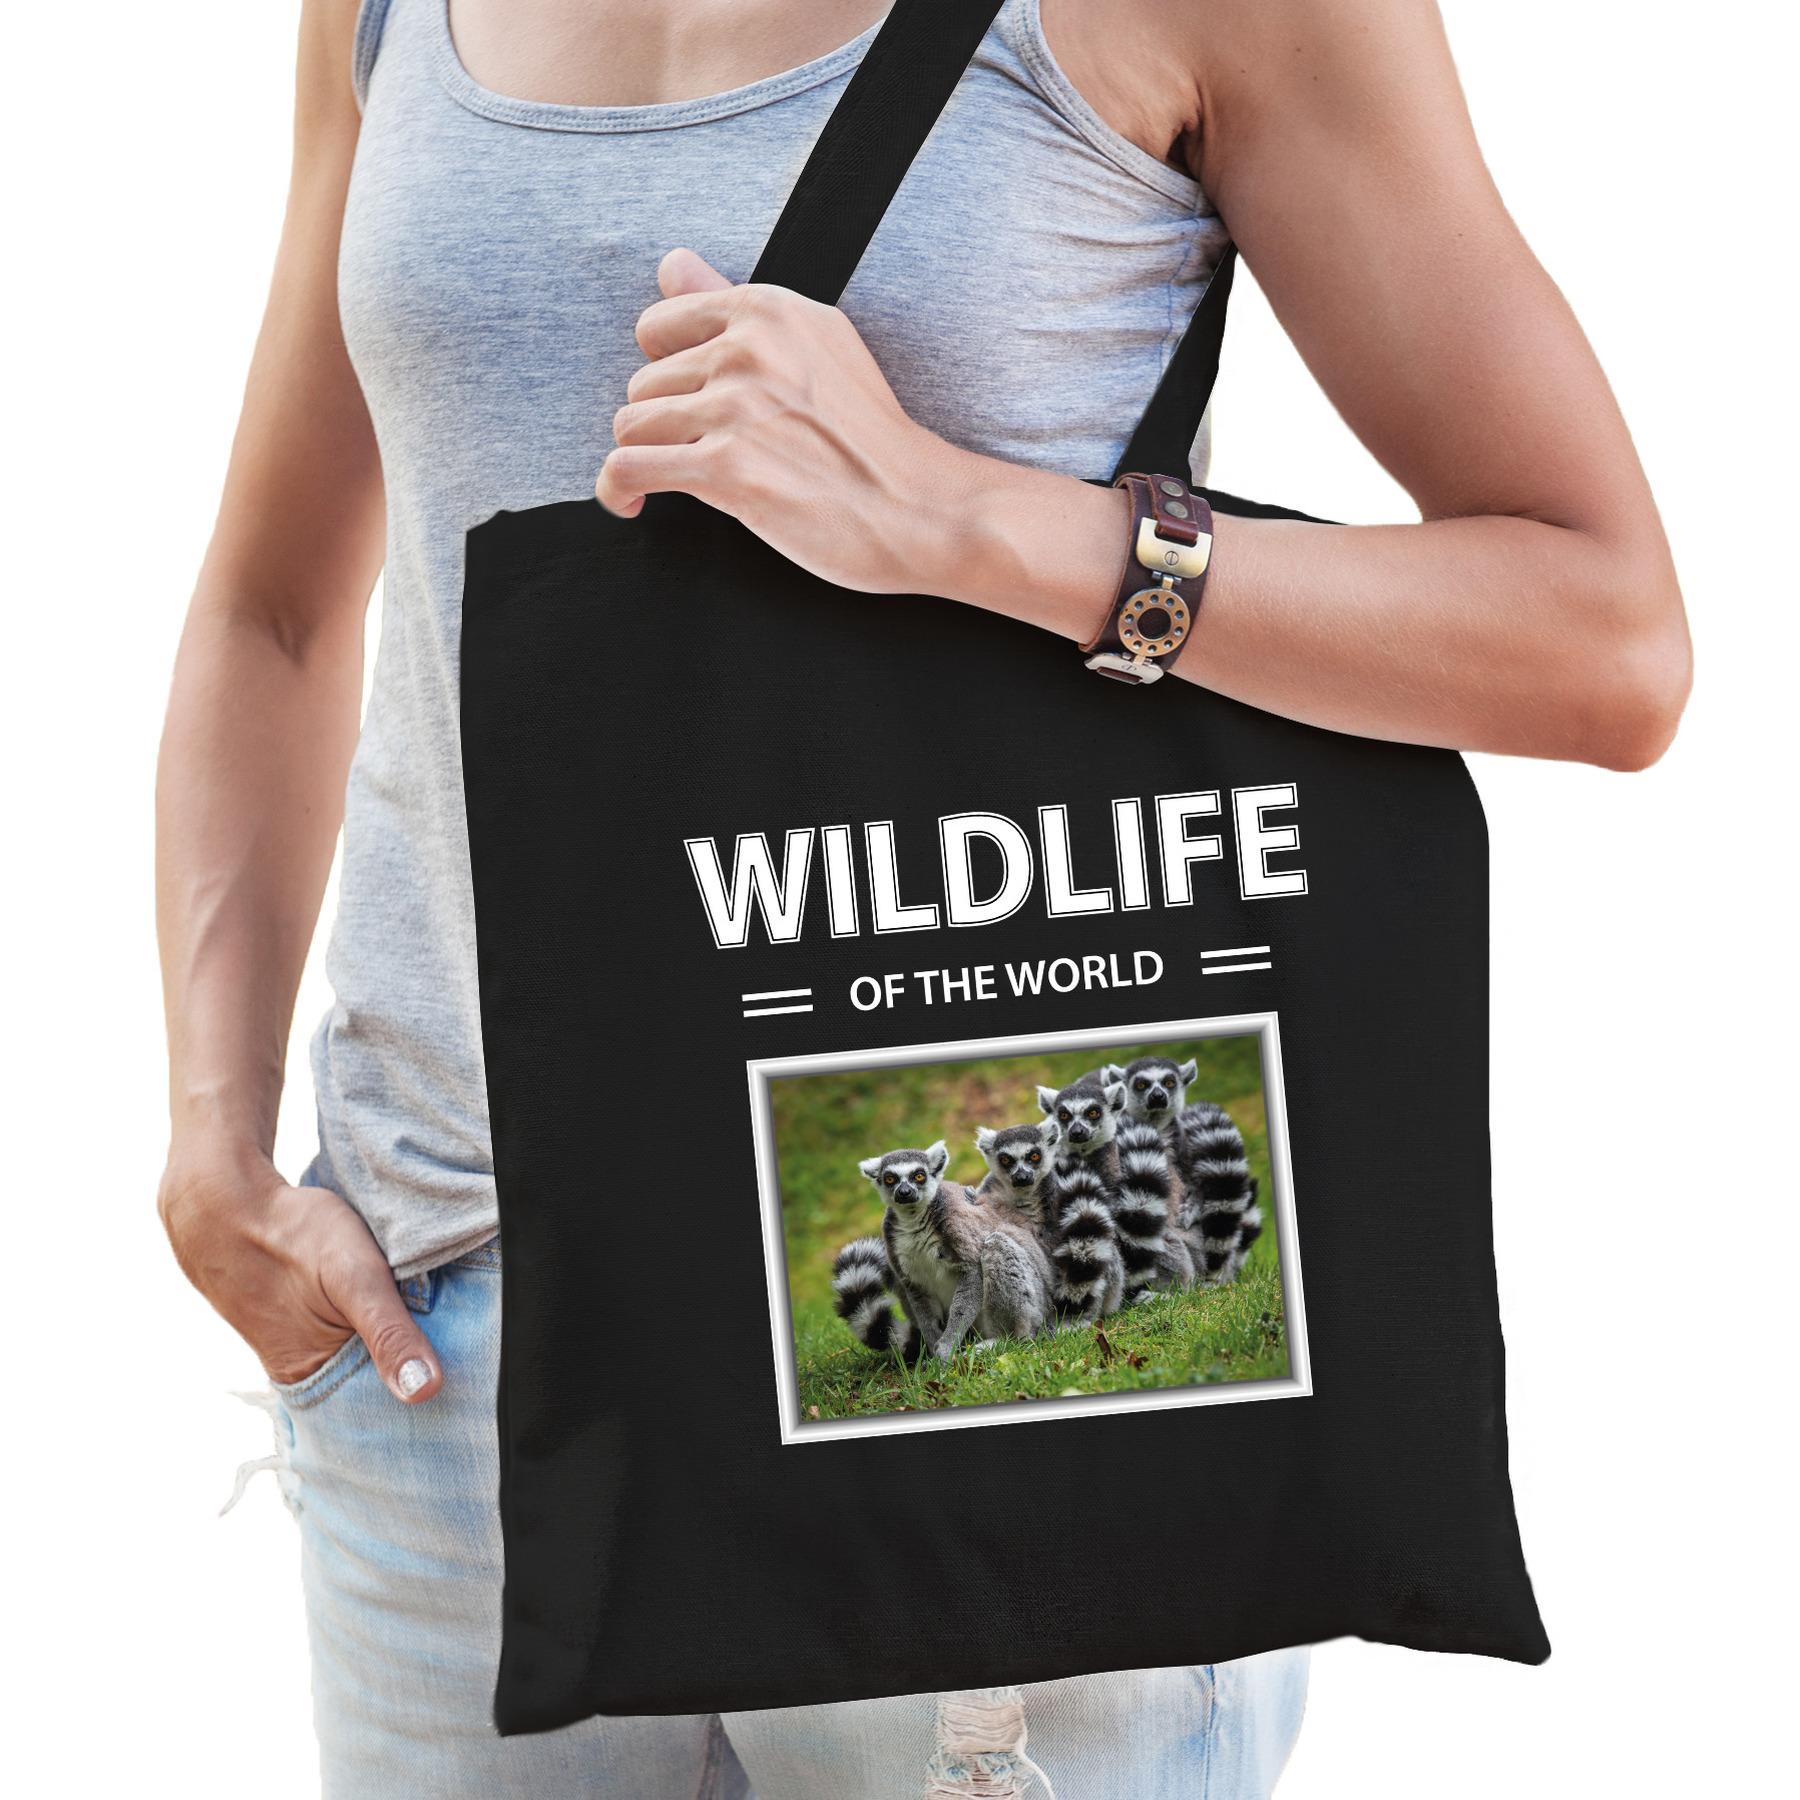 Katoenen tasje Apen zwart - wildlife of the world Ringstaart maki cadeau tas